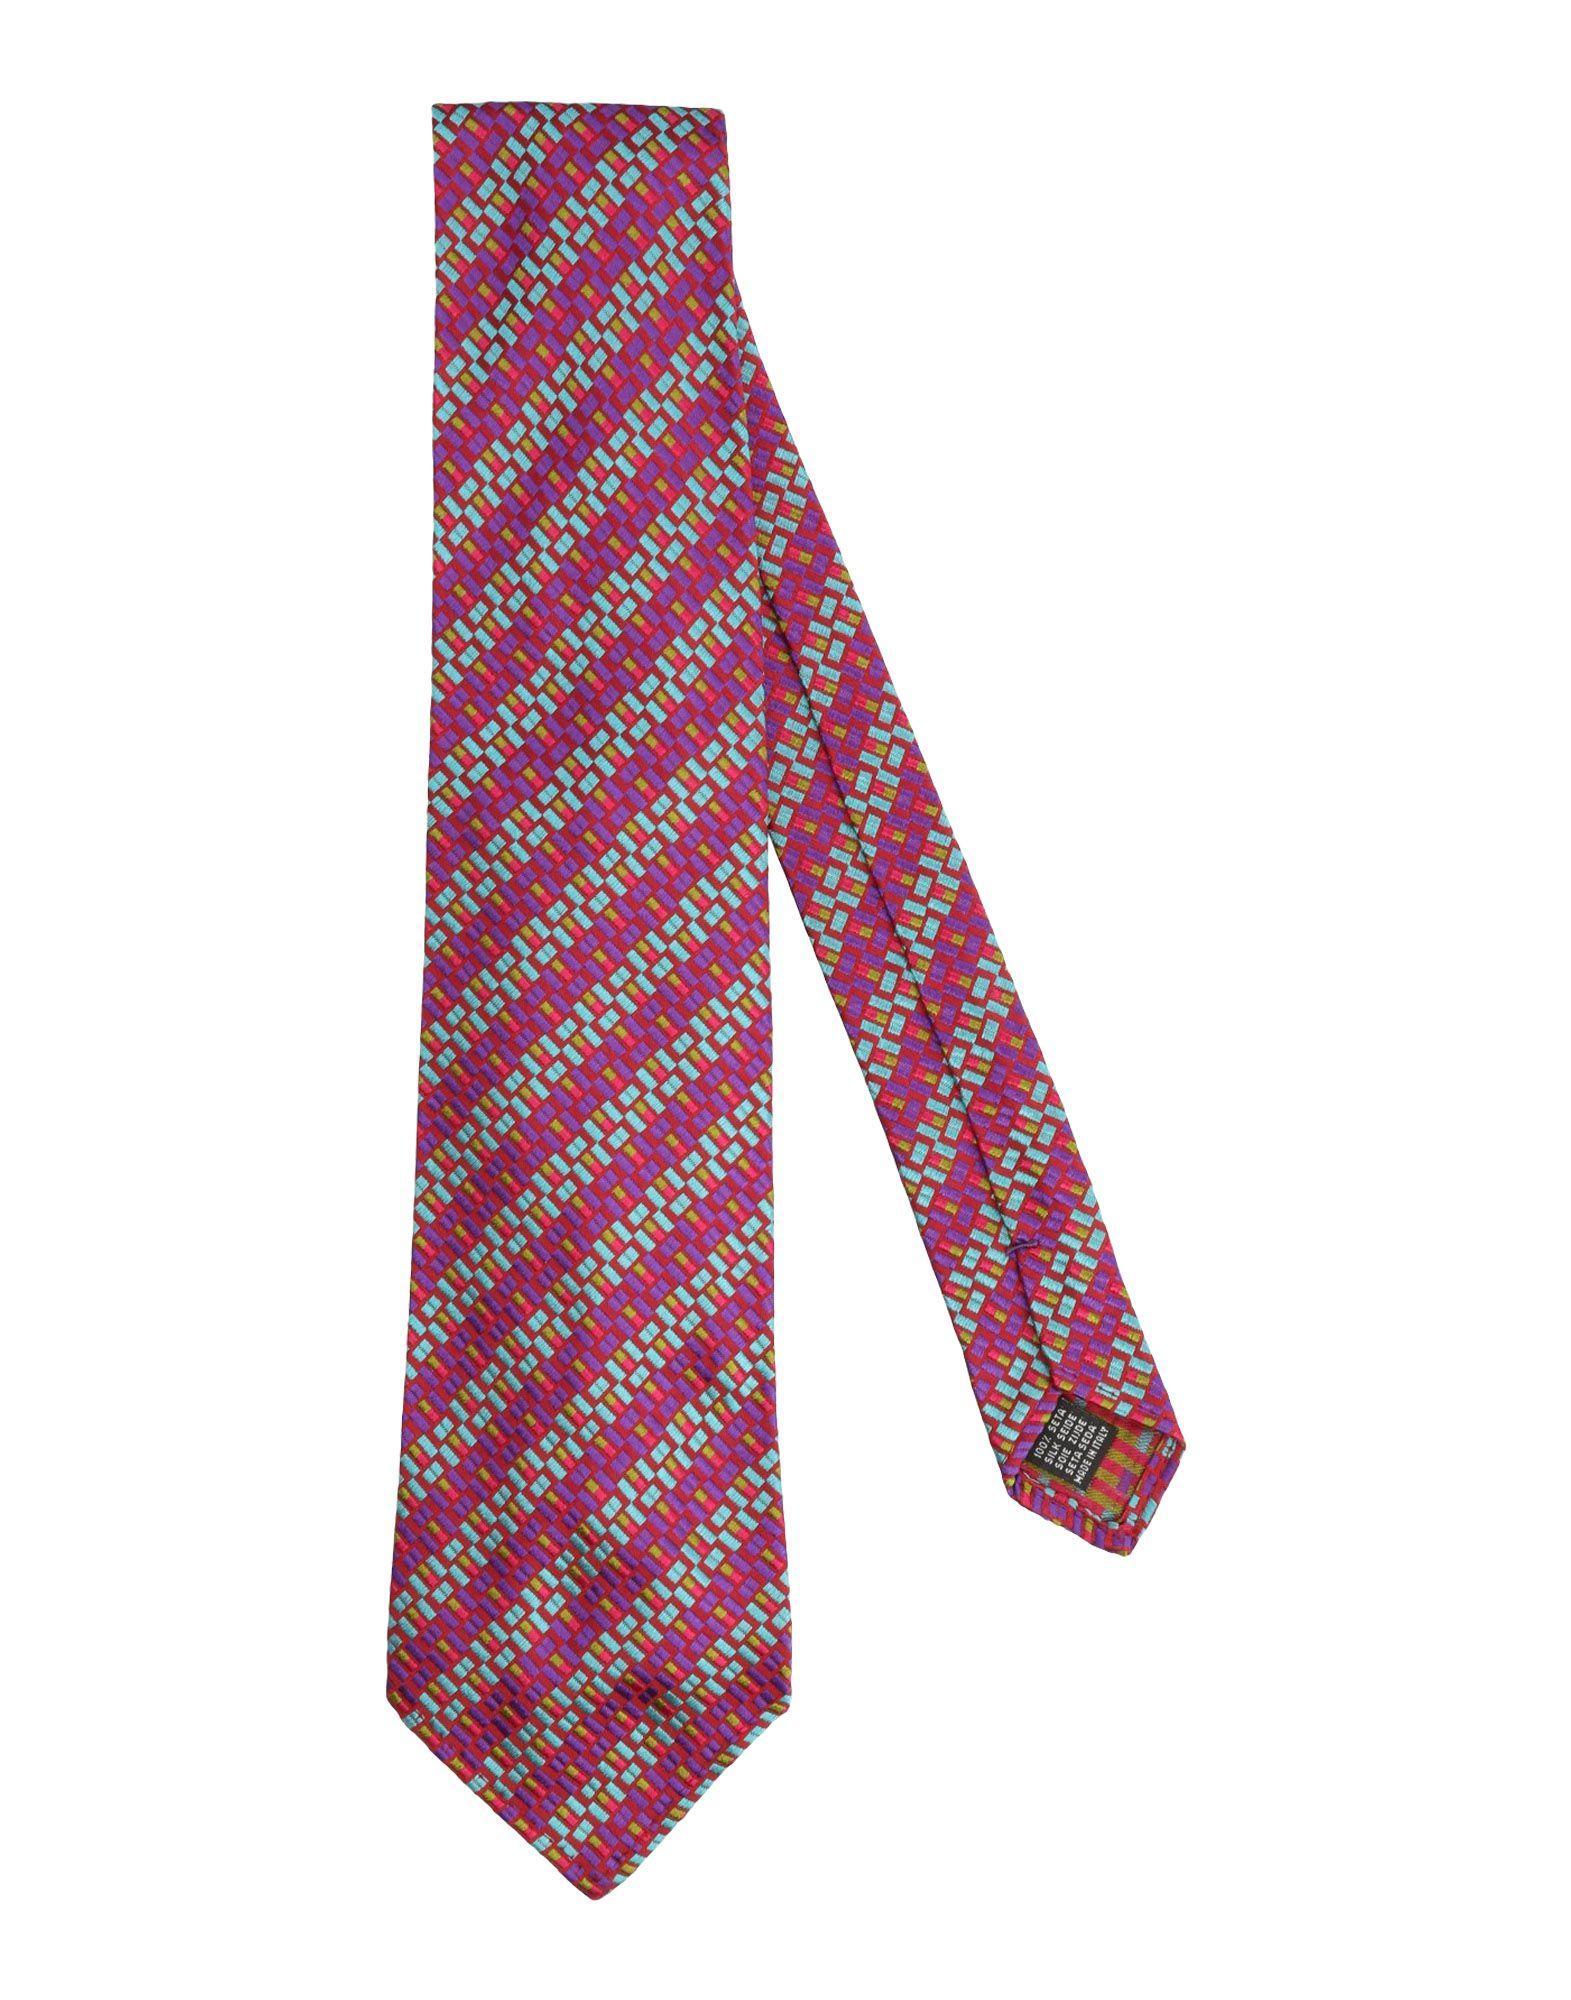 Dsquared2 Tie In Garnet